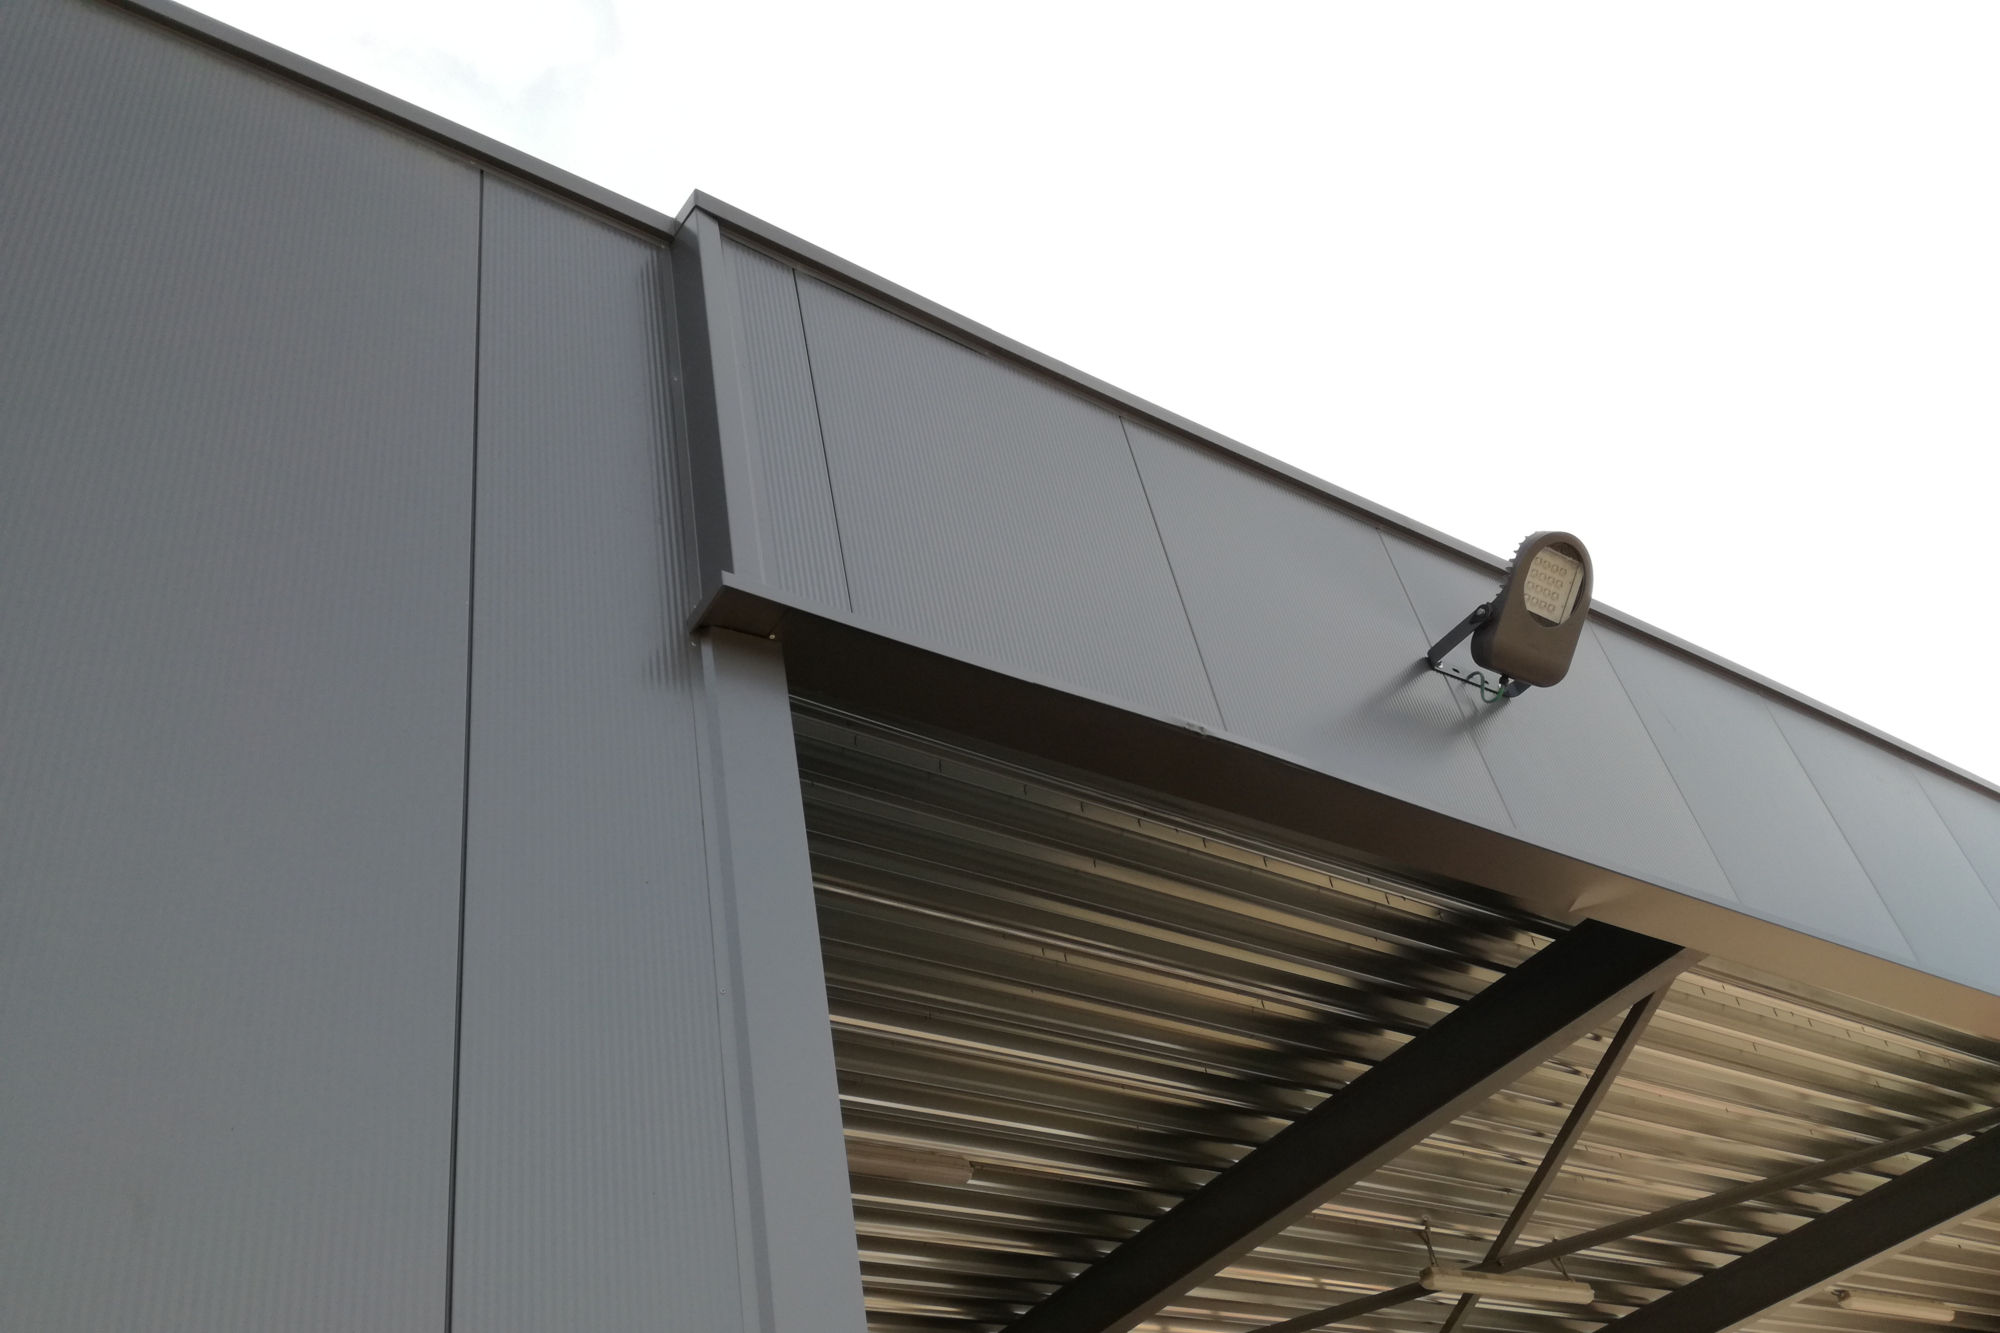 Uitbreiding bedrijfsgebouw Zonhoven_architect Do Modus detail